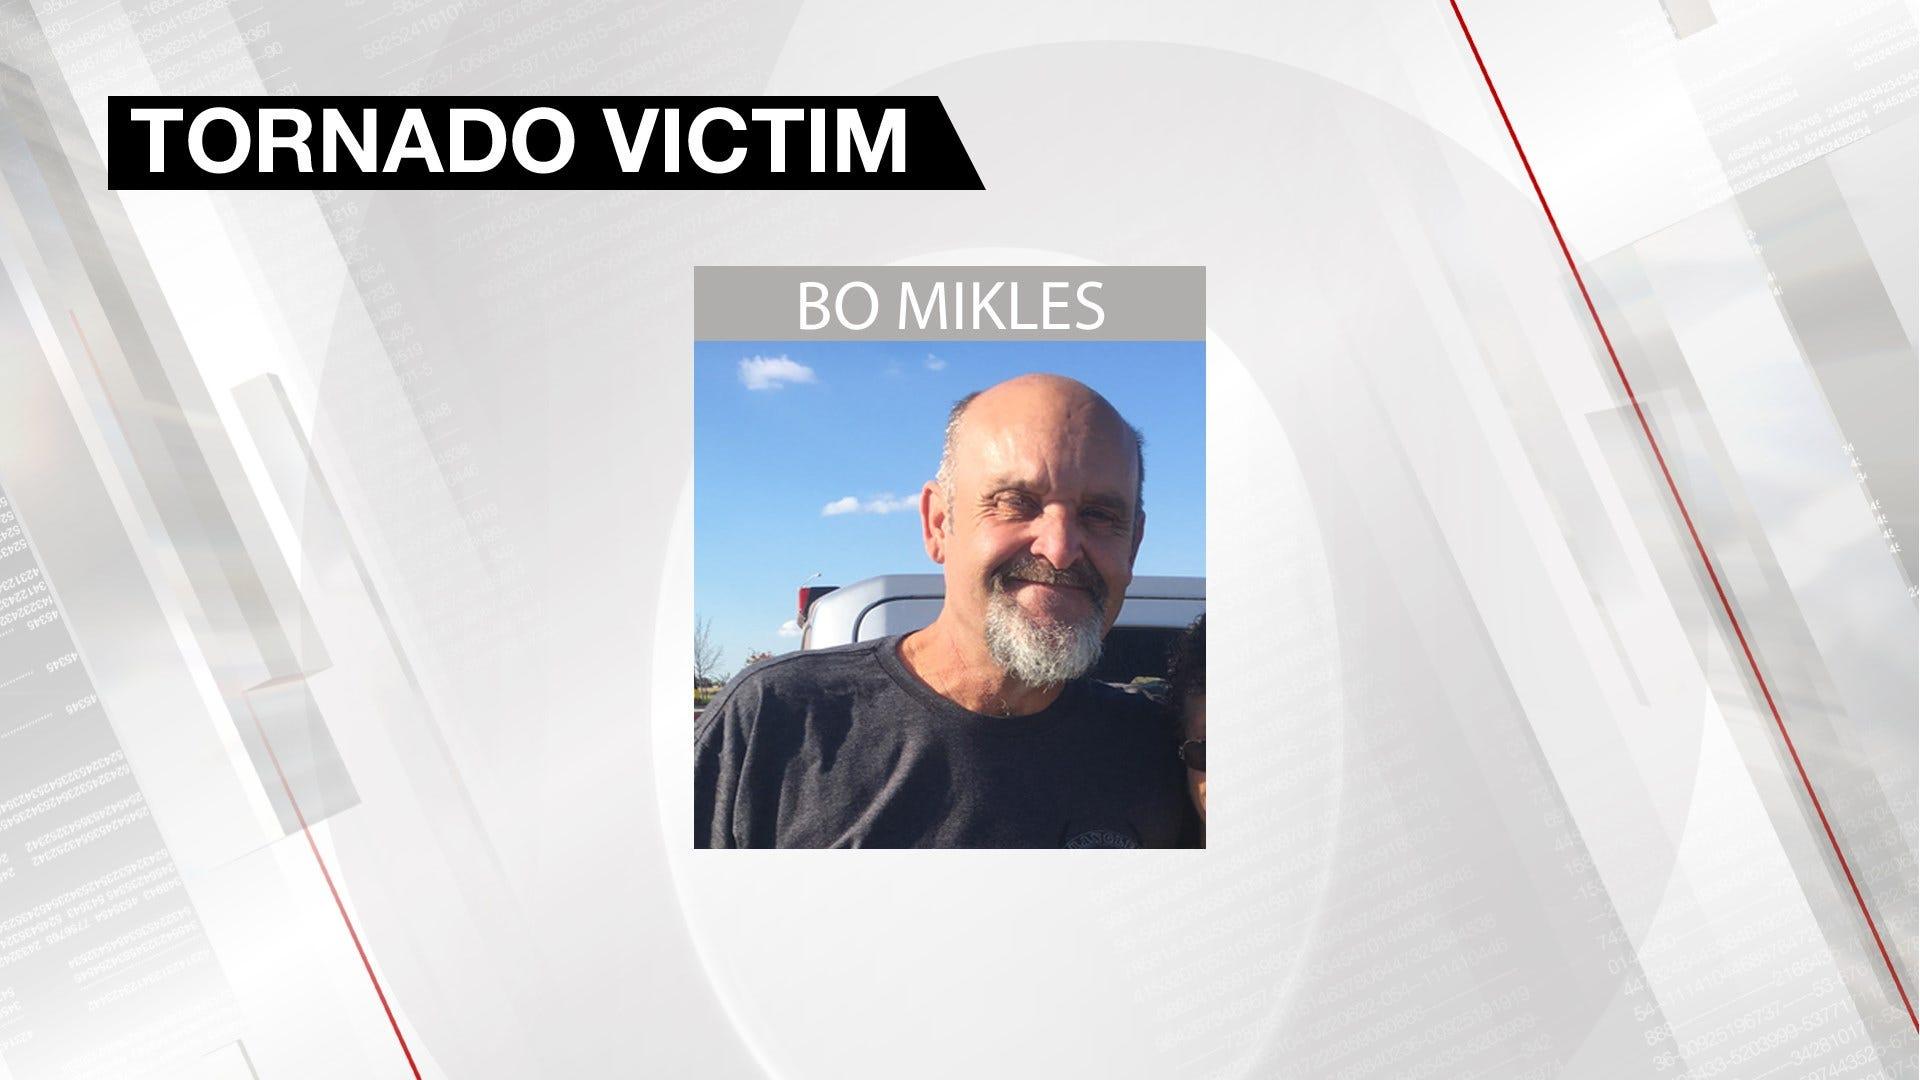 Family Of Elk City Tornado Victim Share His Story